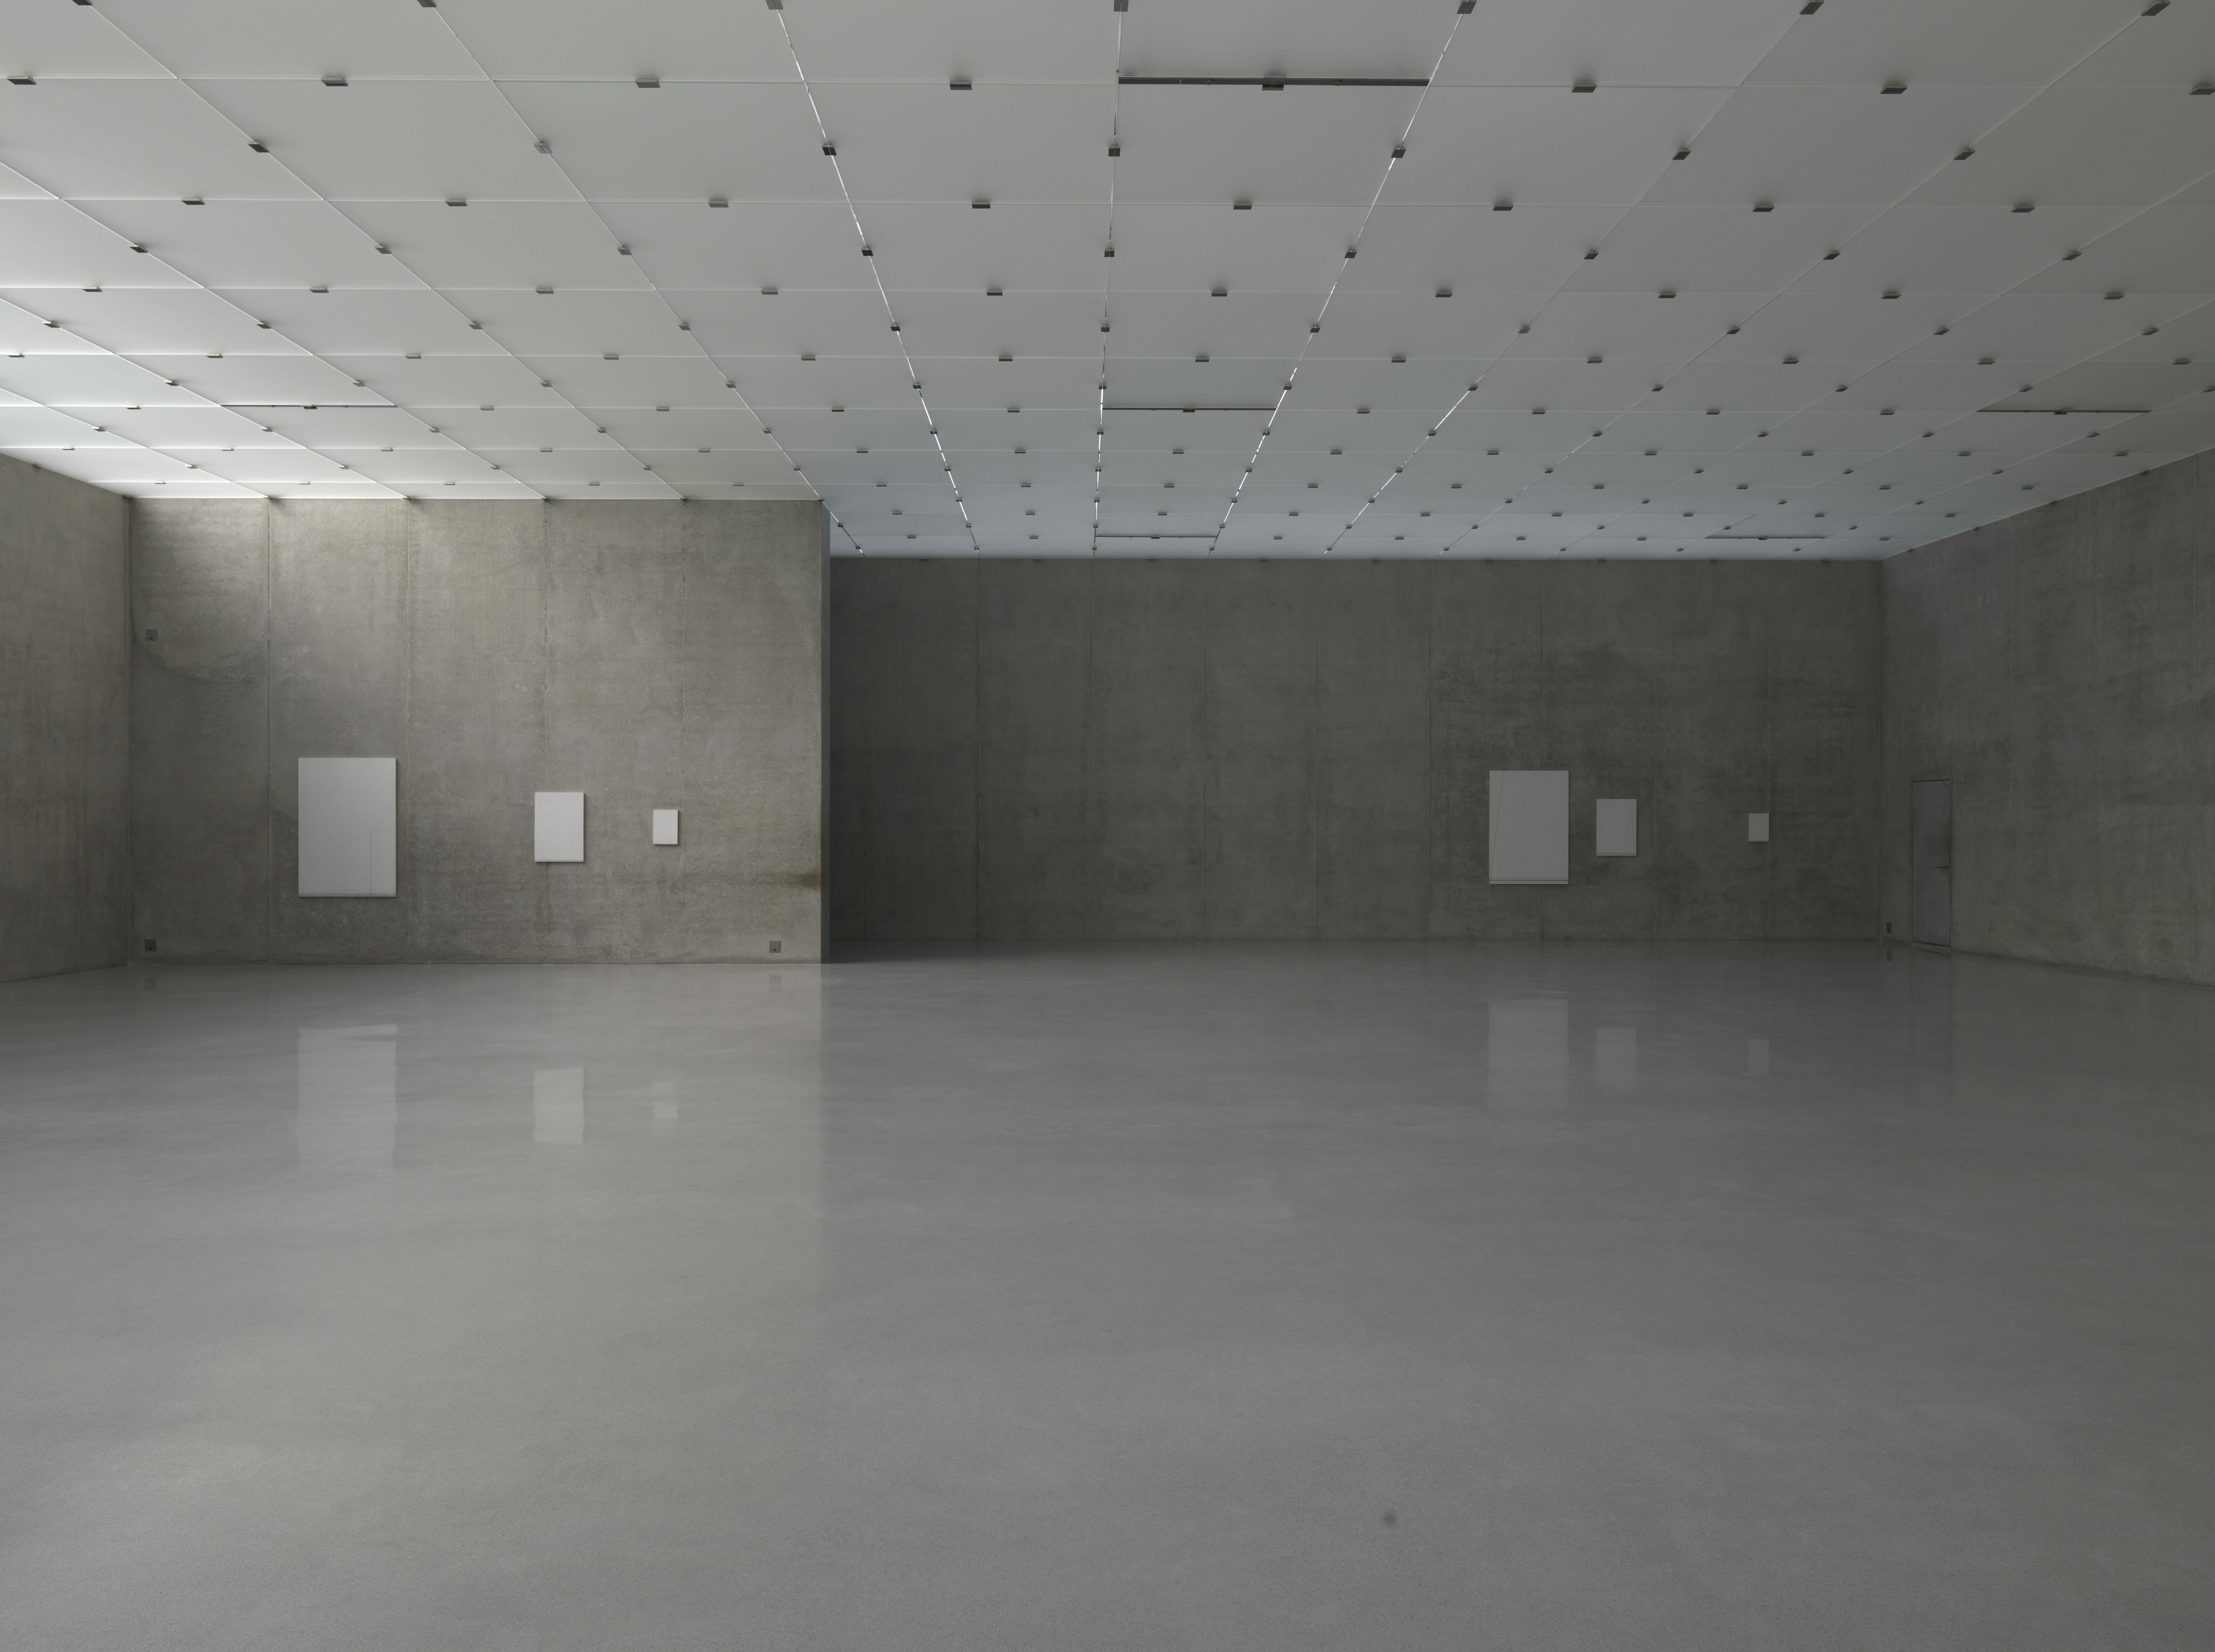 kunsthaus bregenz - Google Search